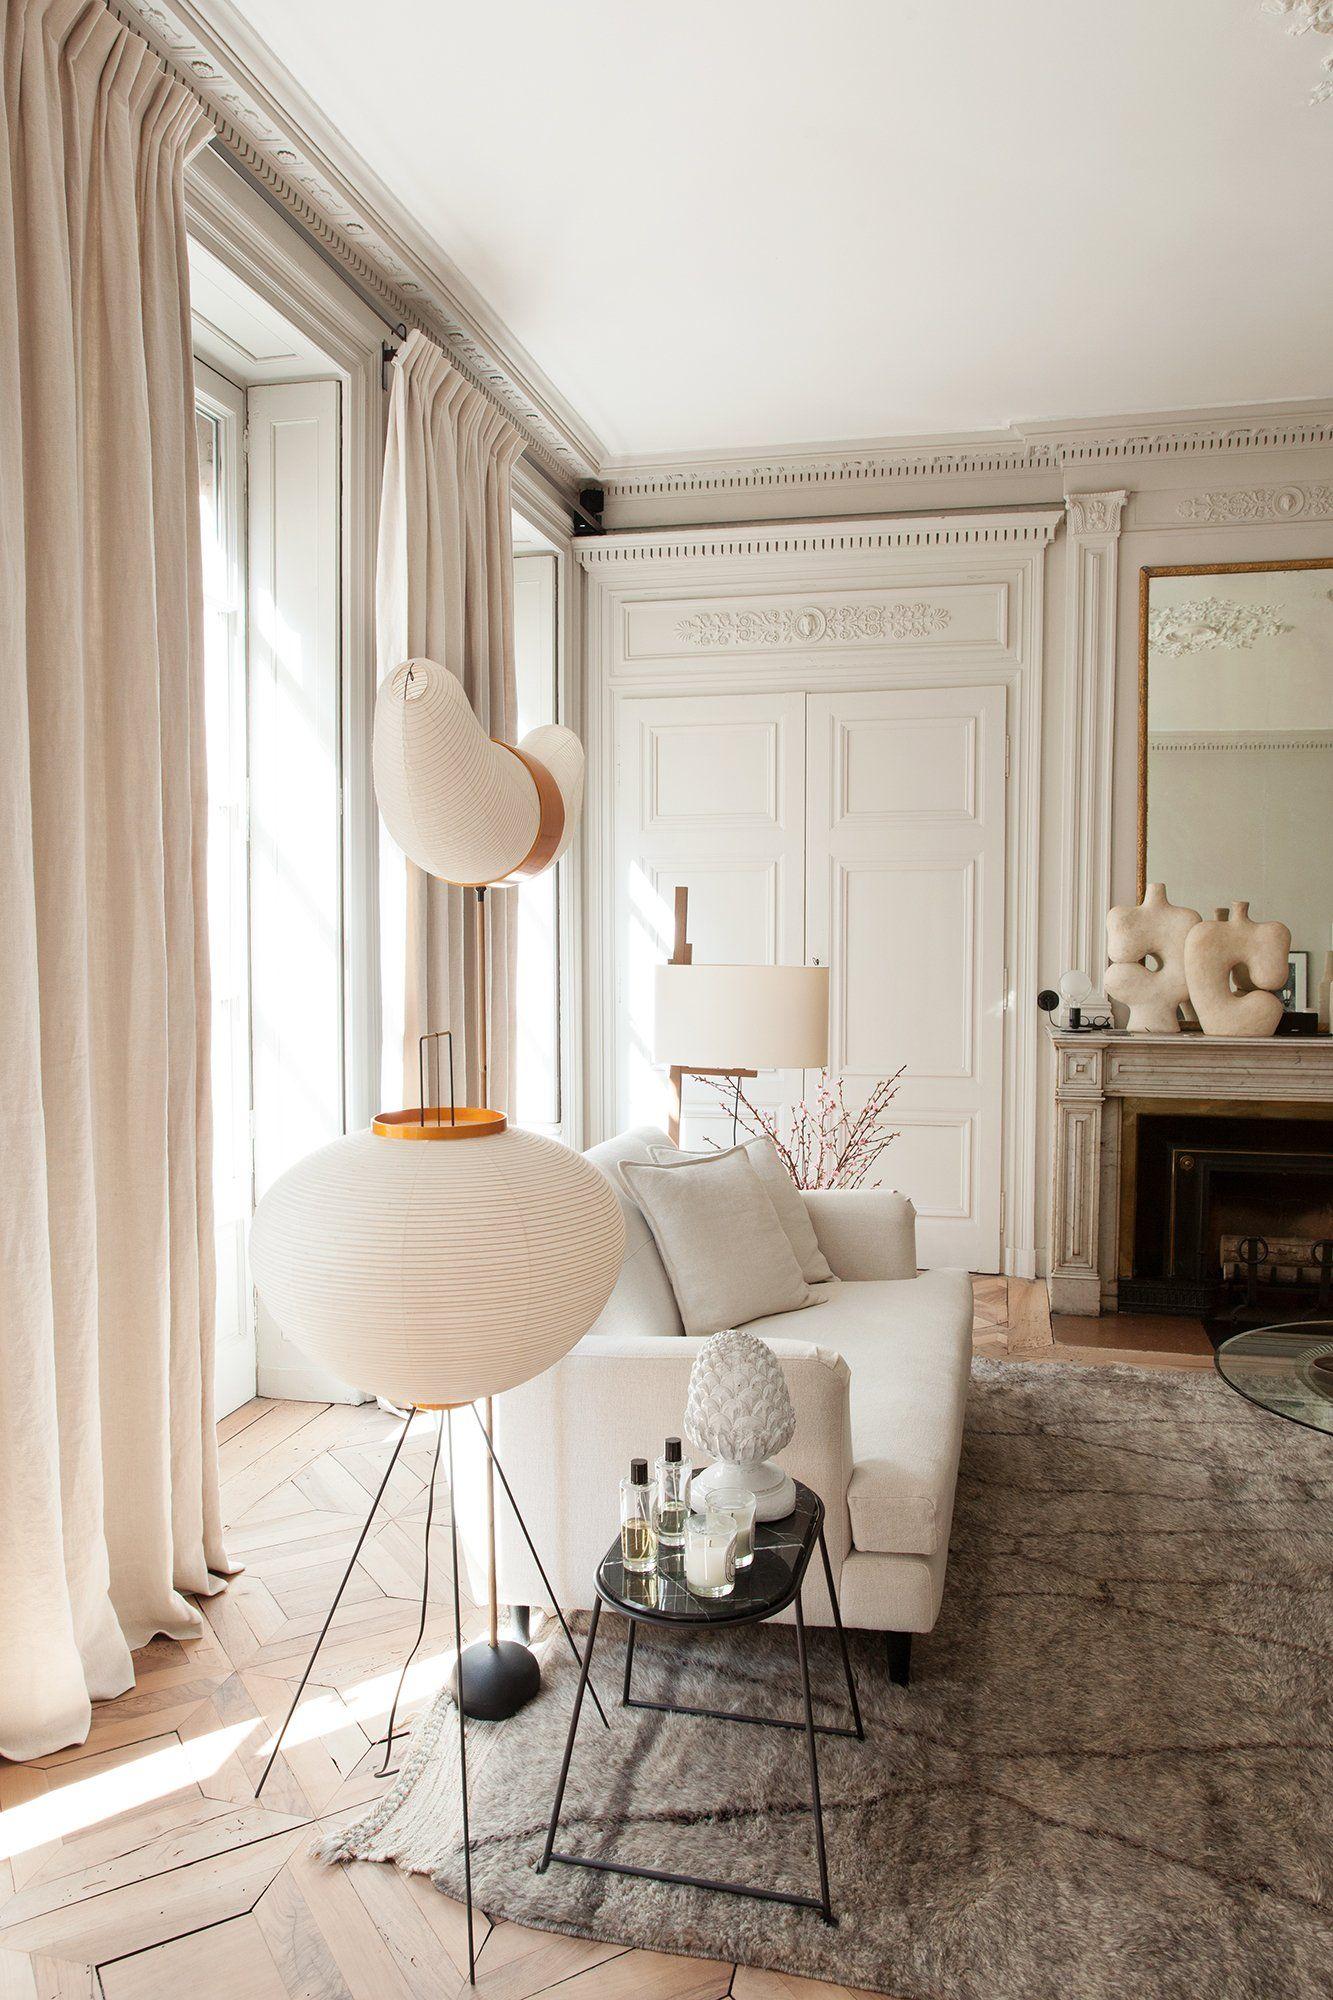 Maison Hand Between Craft And Modernism Interior Design